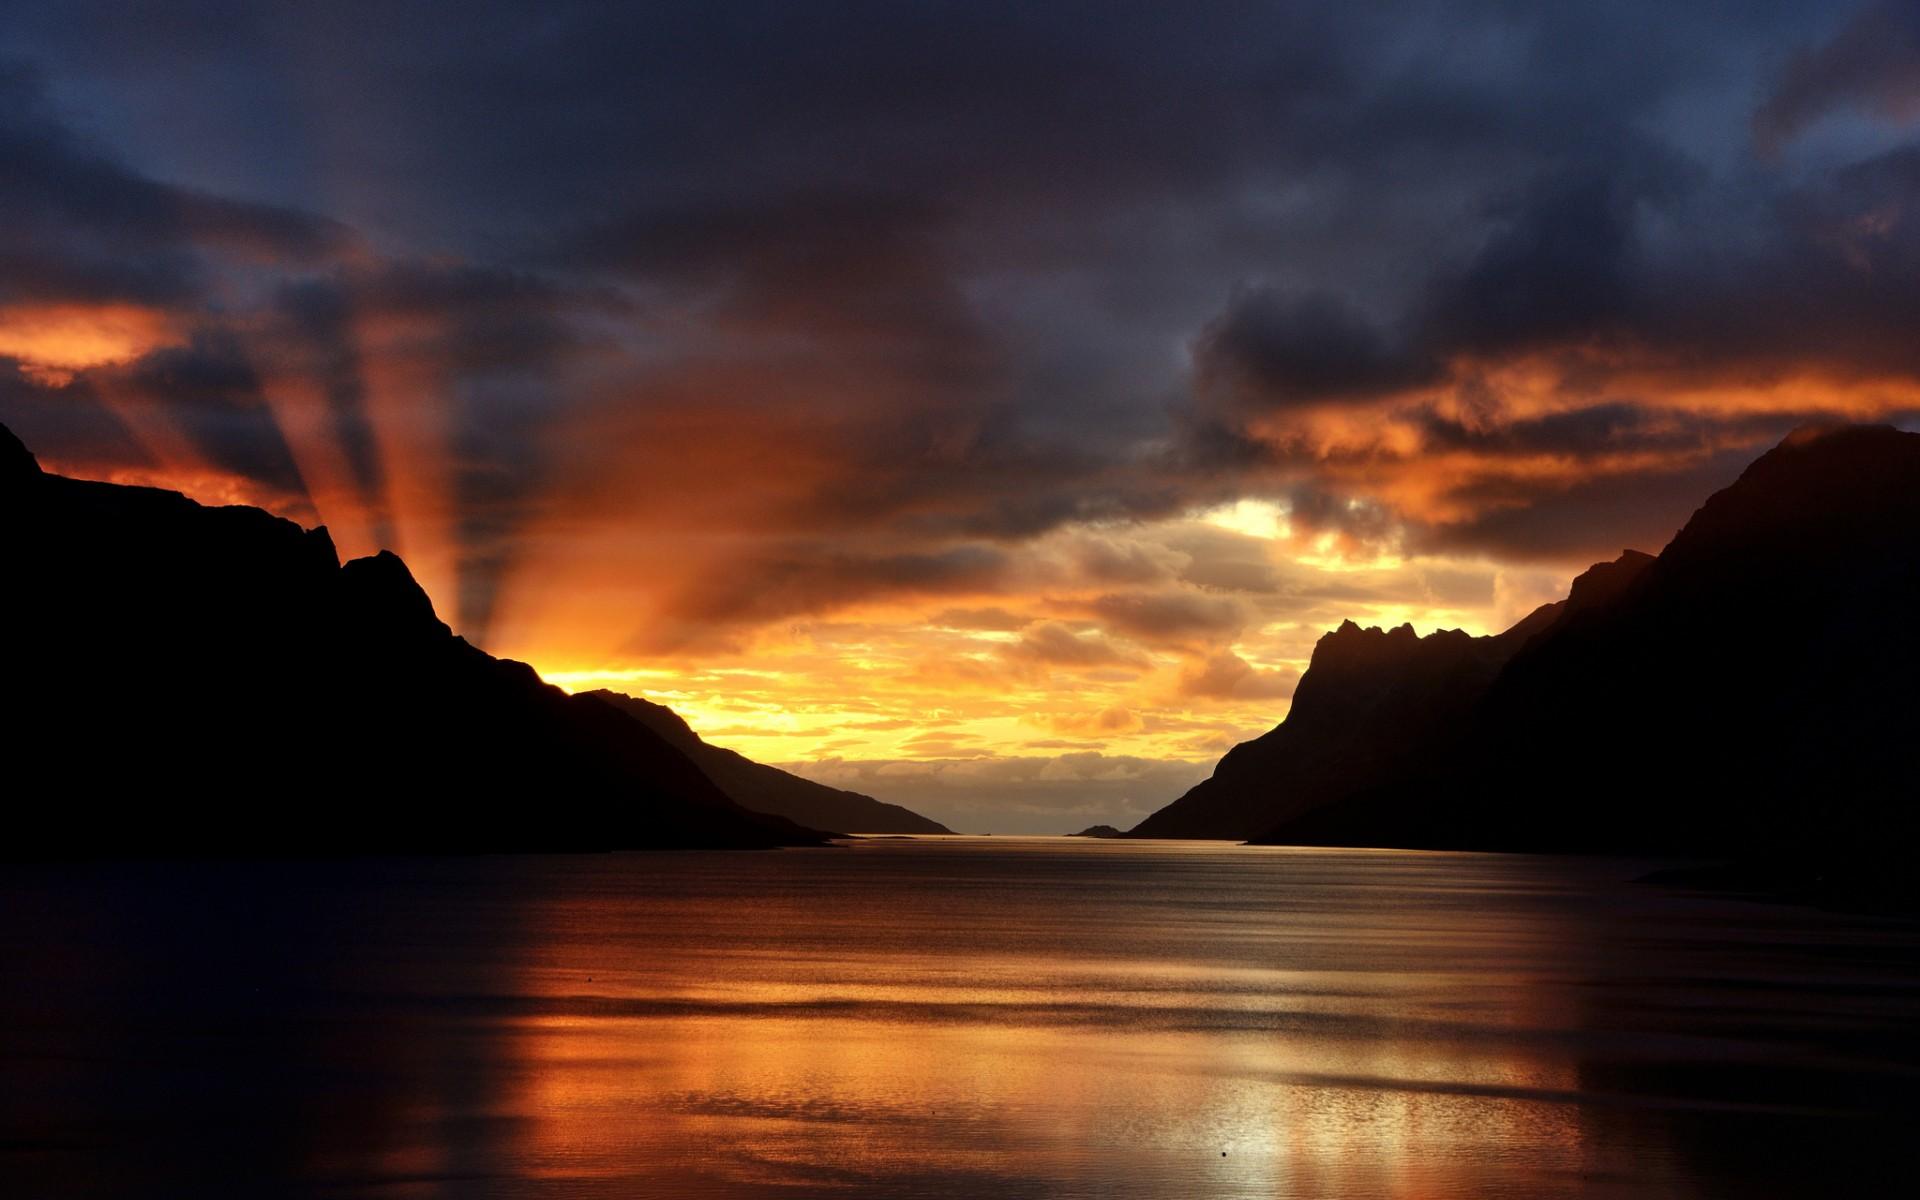 Desktop wallpaper tramonto sul lago for Foto full hd per desktop